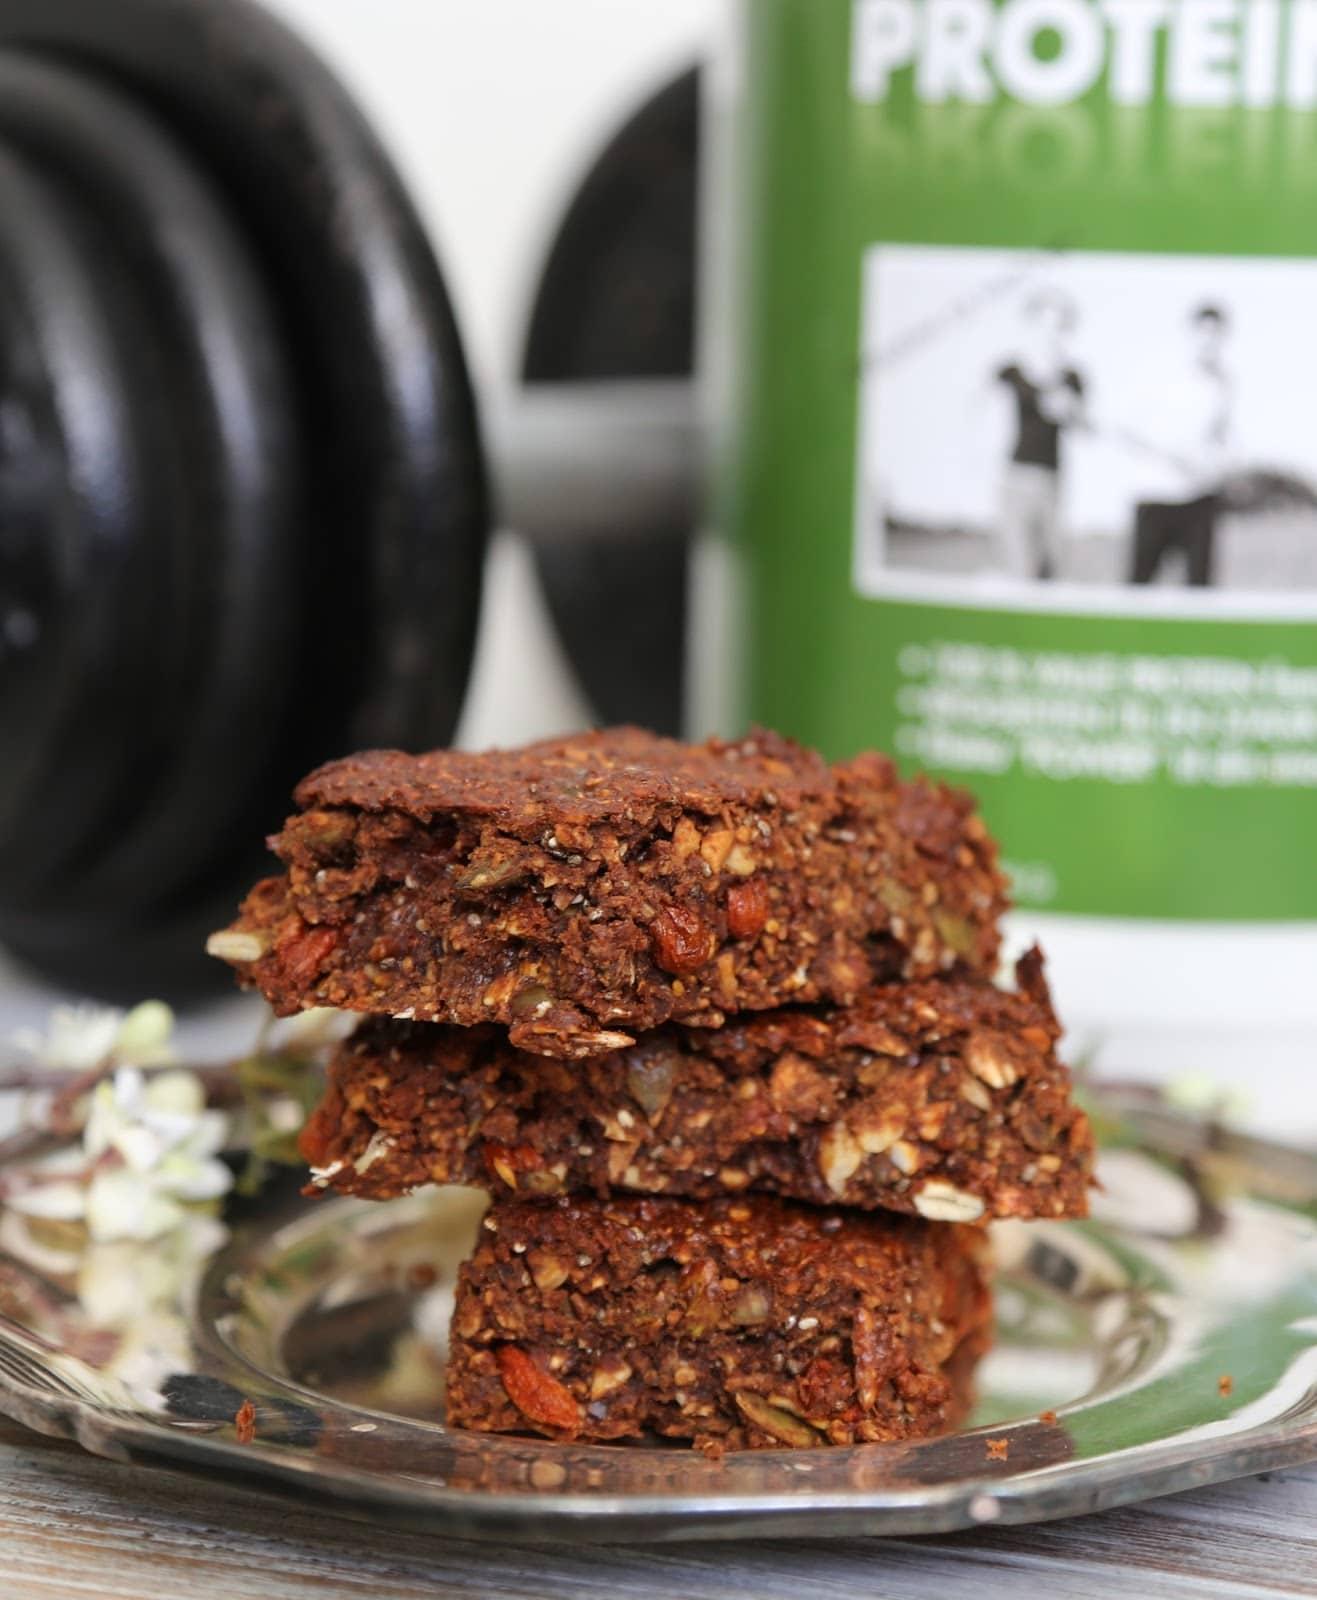 Opskrift på sund hjemmelavet proteinbar